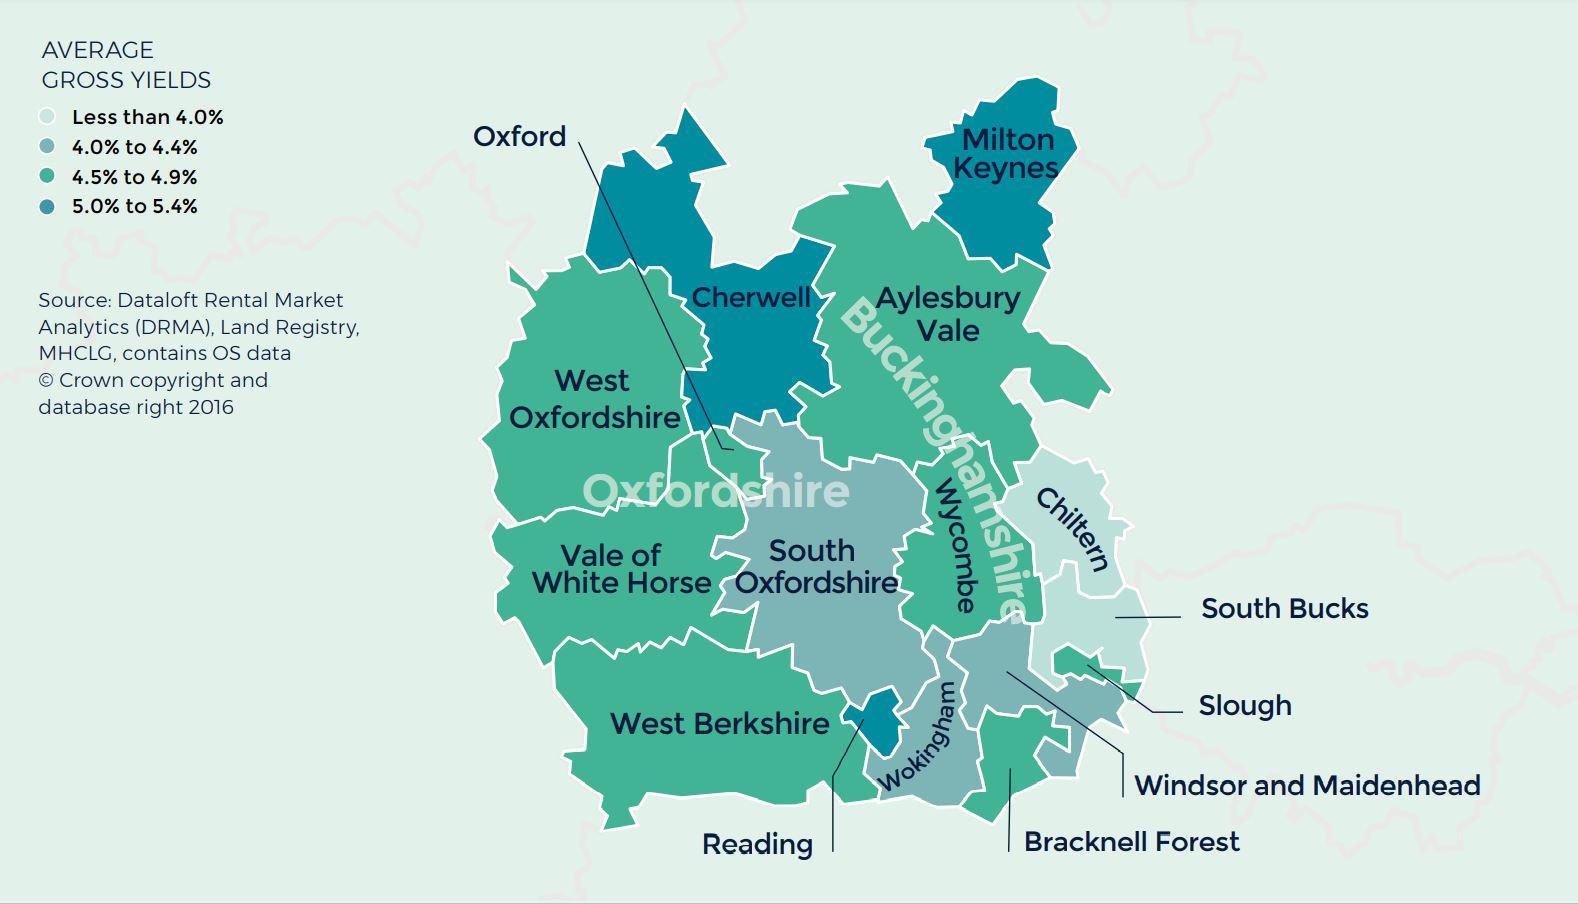 Thames Valley Berkshire Oxfordshire Buckinghamshire Regional Property Market Report Autumn 2020